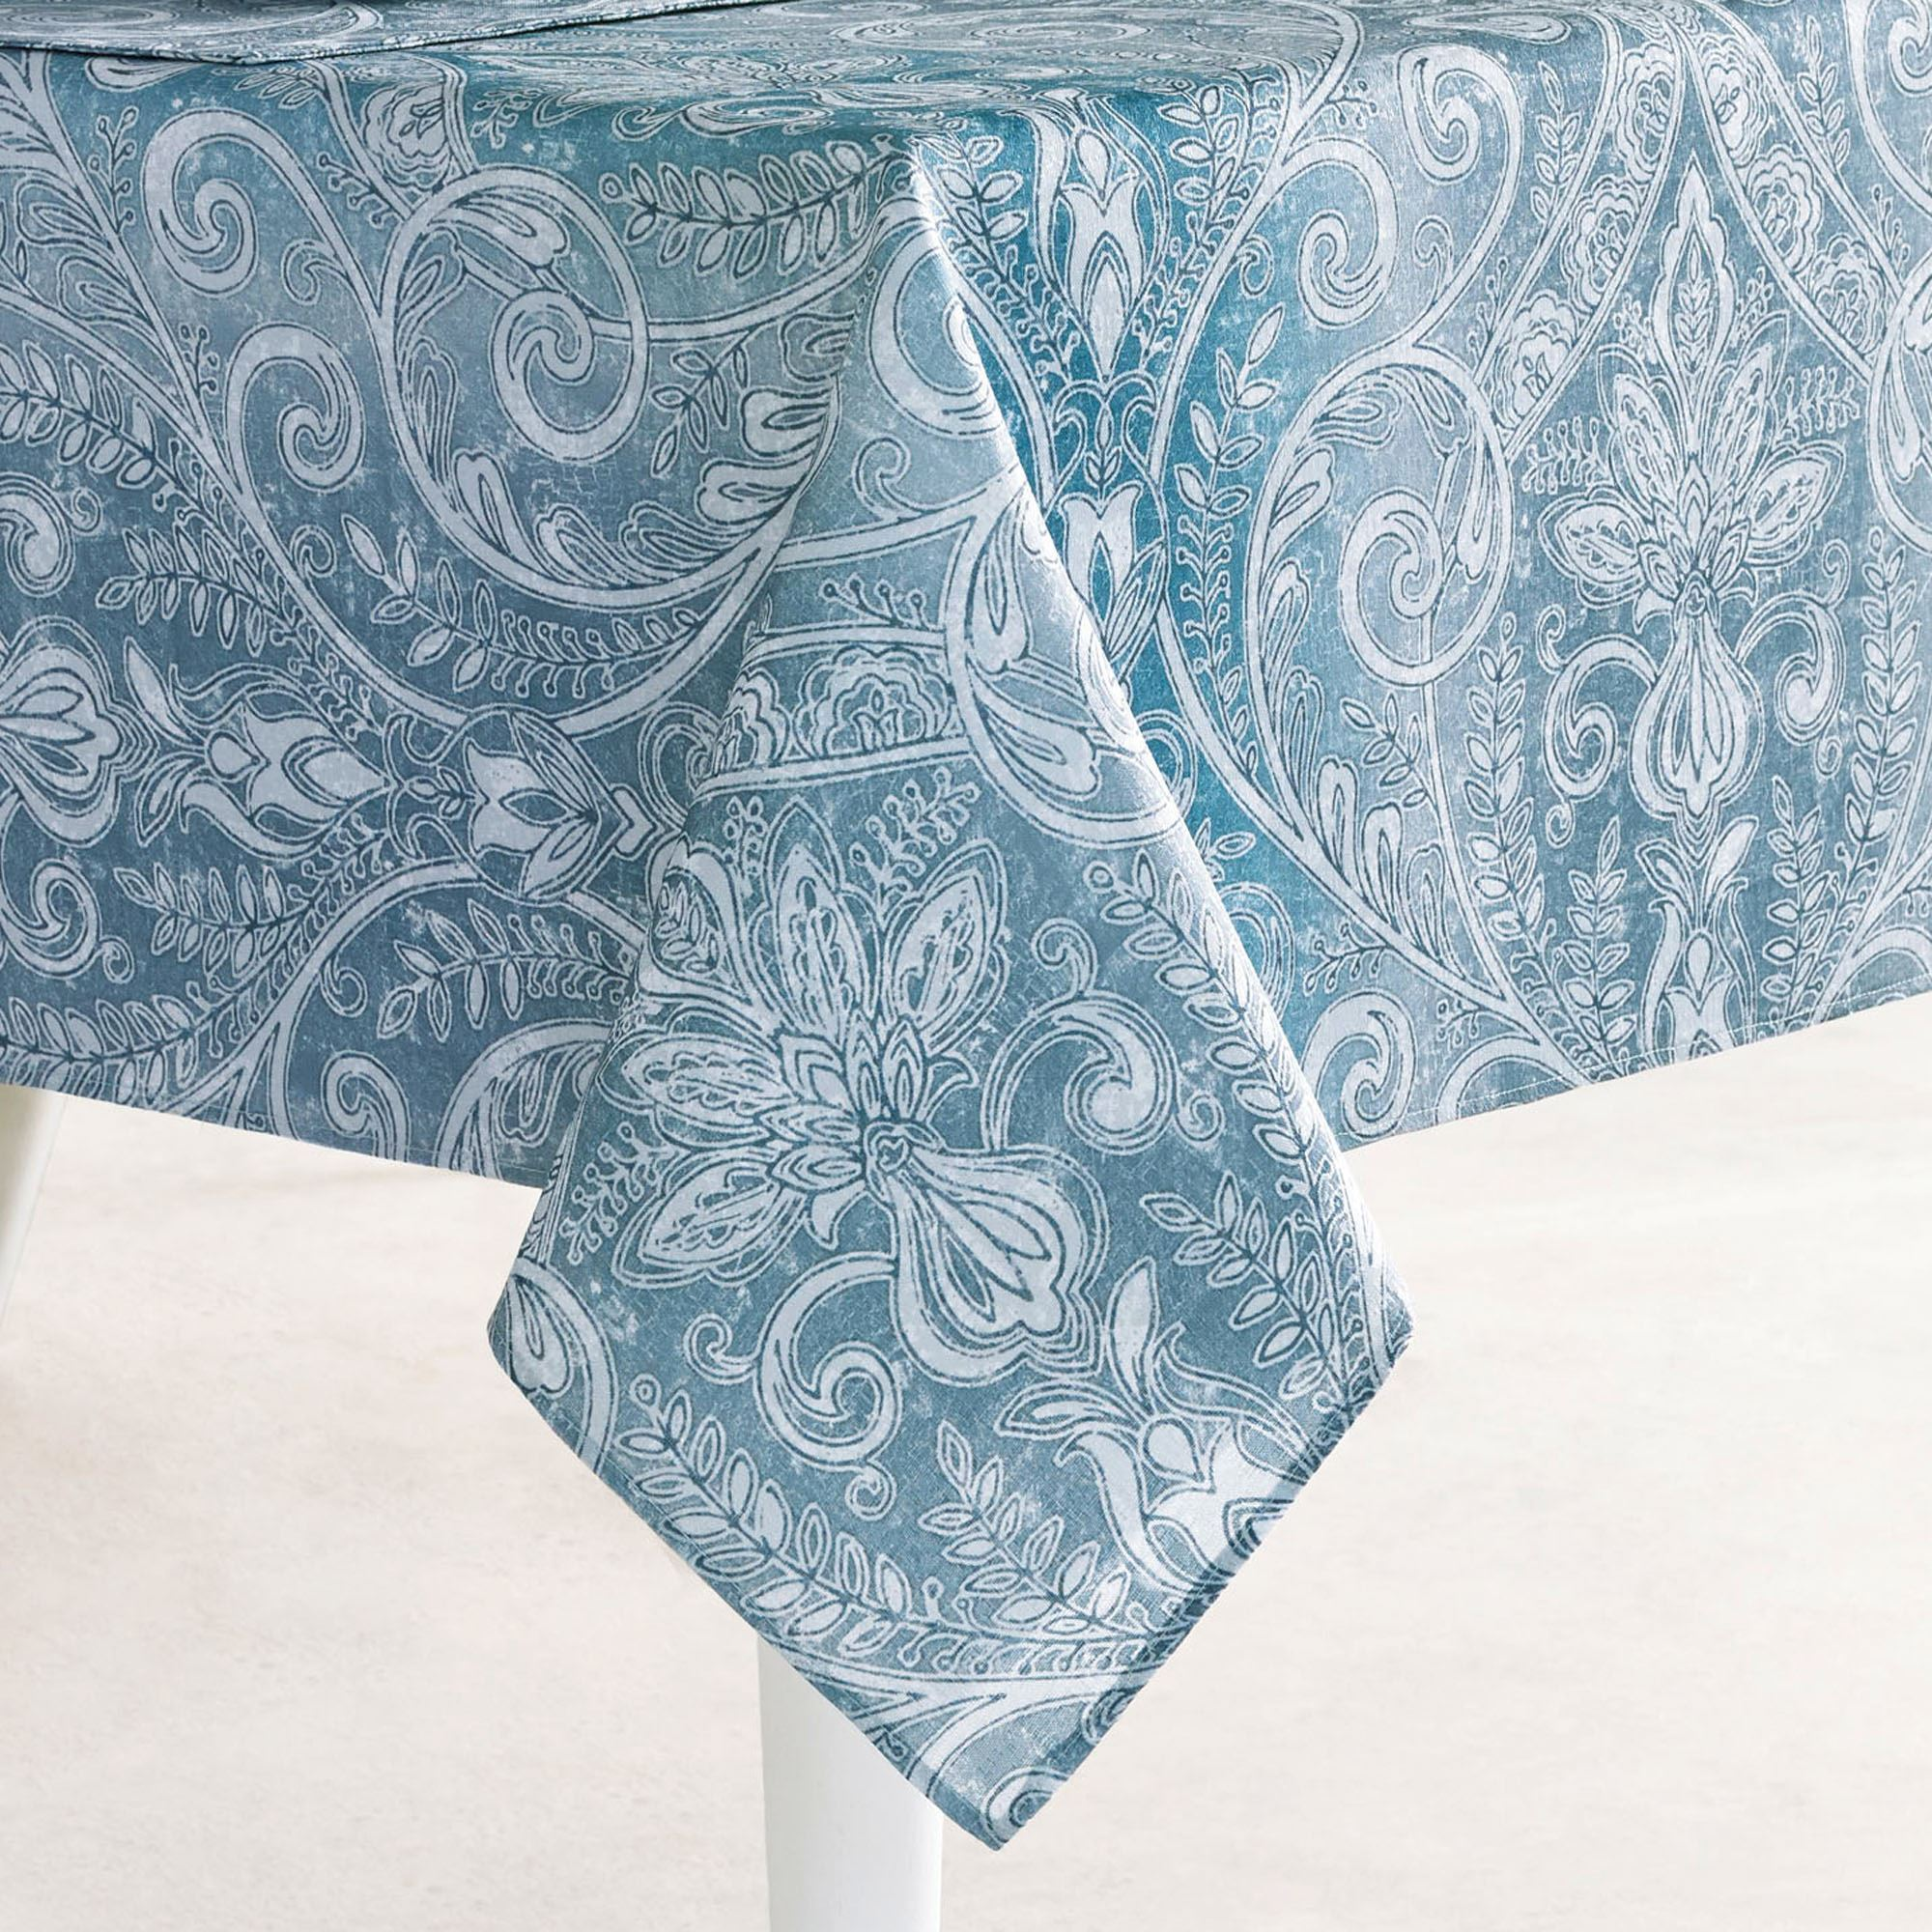 Caroline Oblong Tablecloth Blue